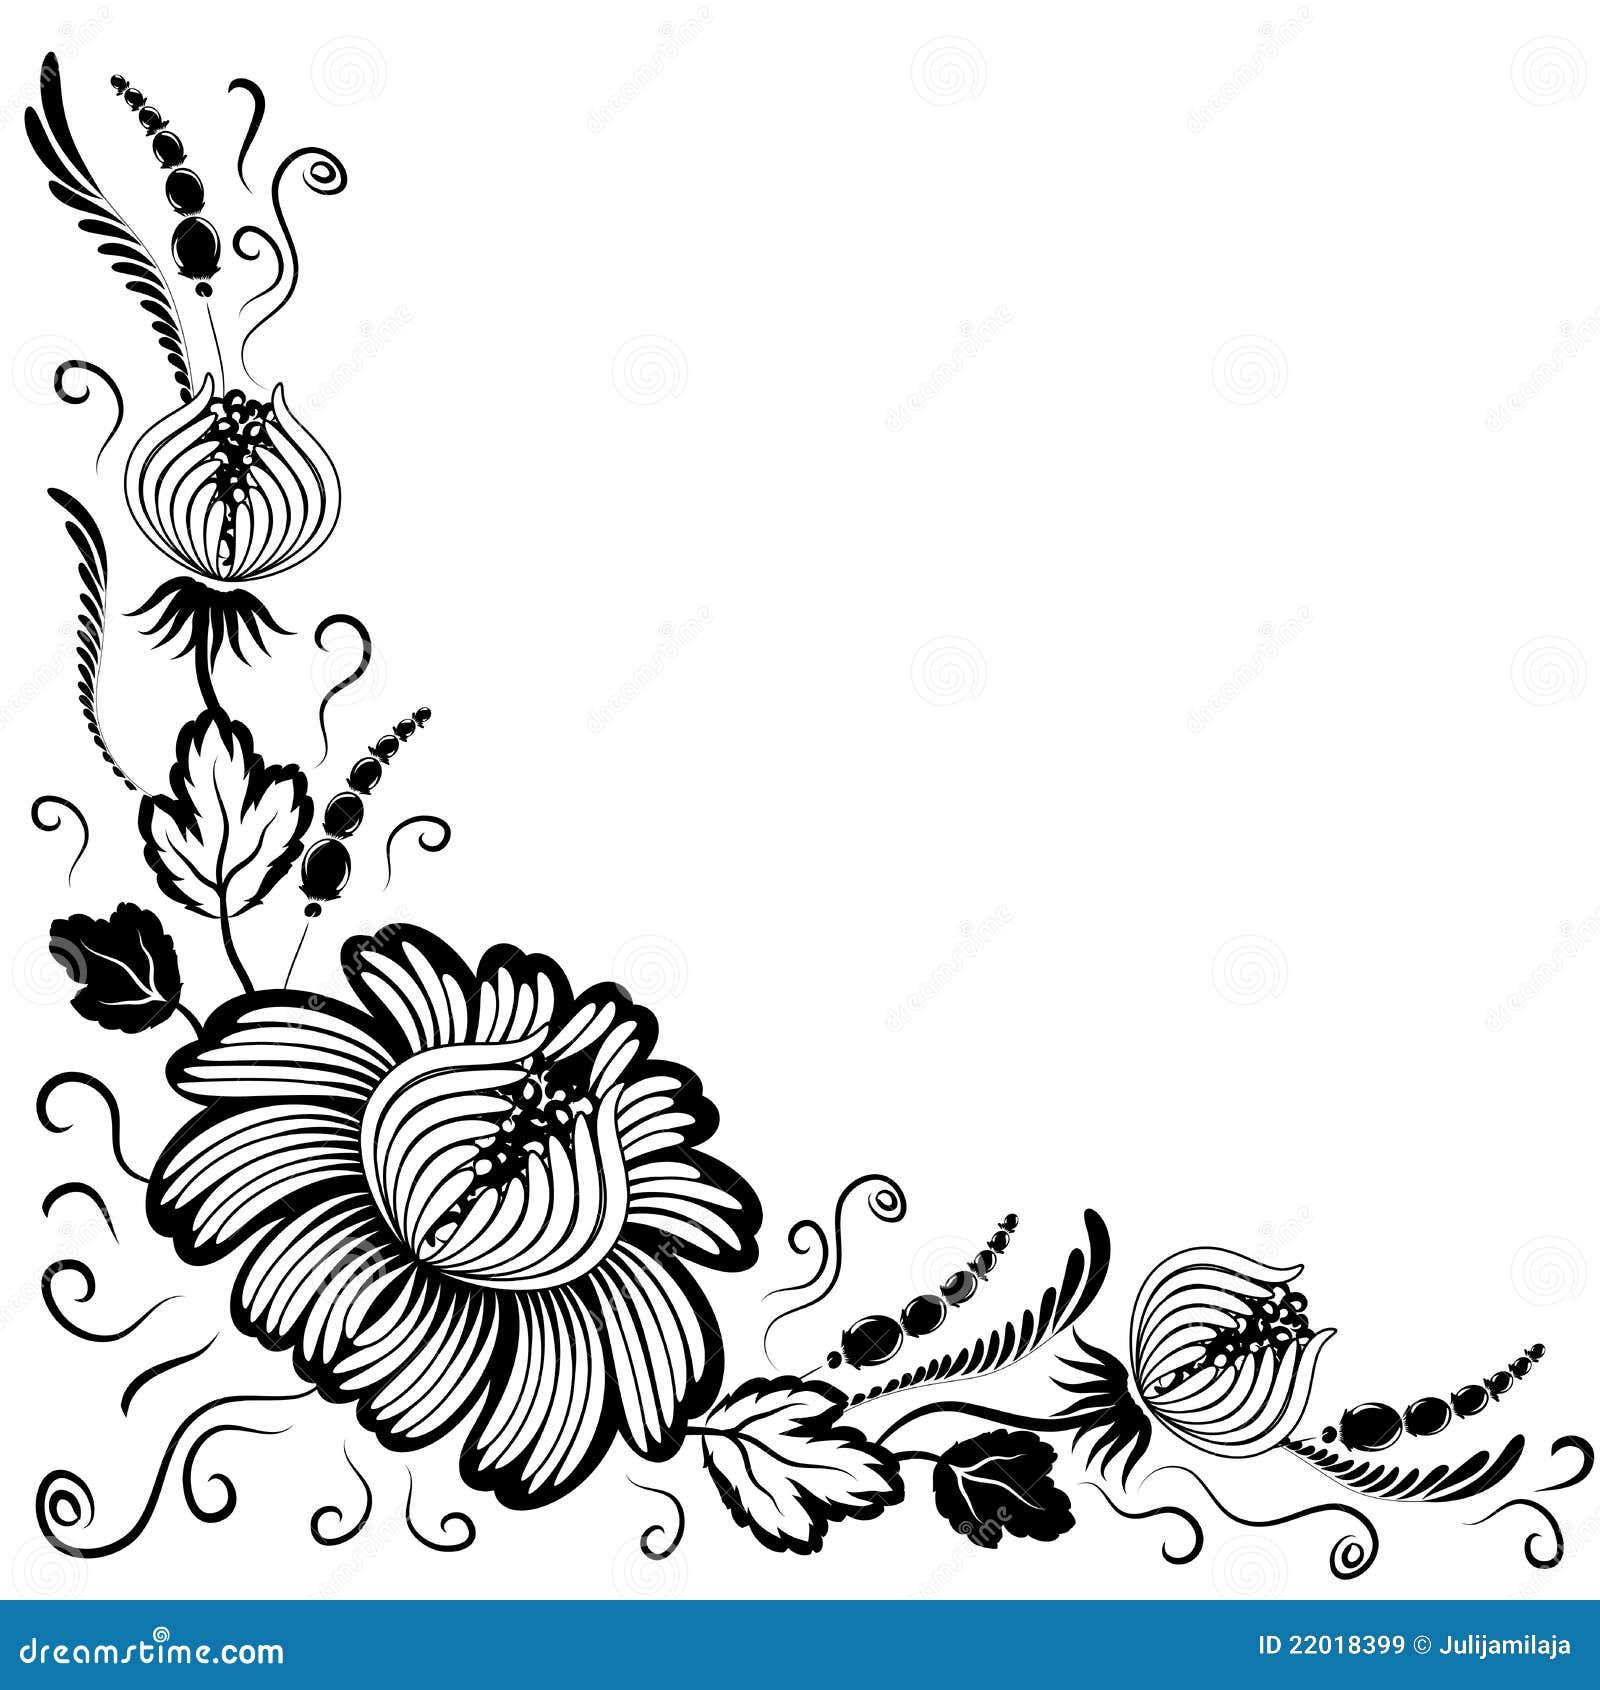 Black Flower On White Background Royalty Free Stock: Black Flowers On A White Background Stock Illustration